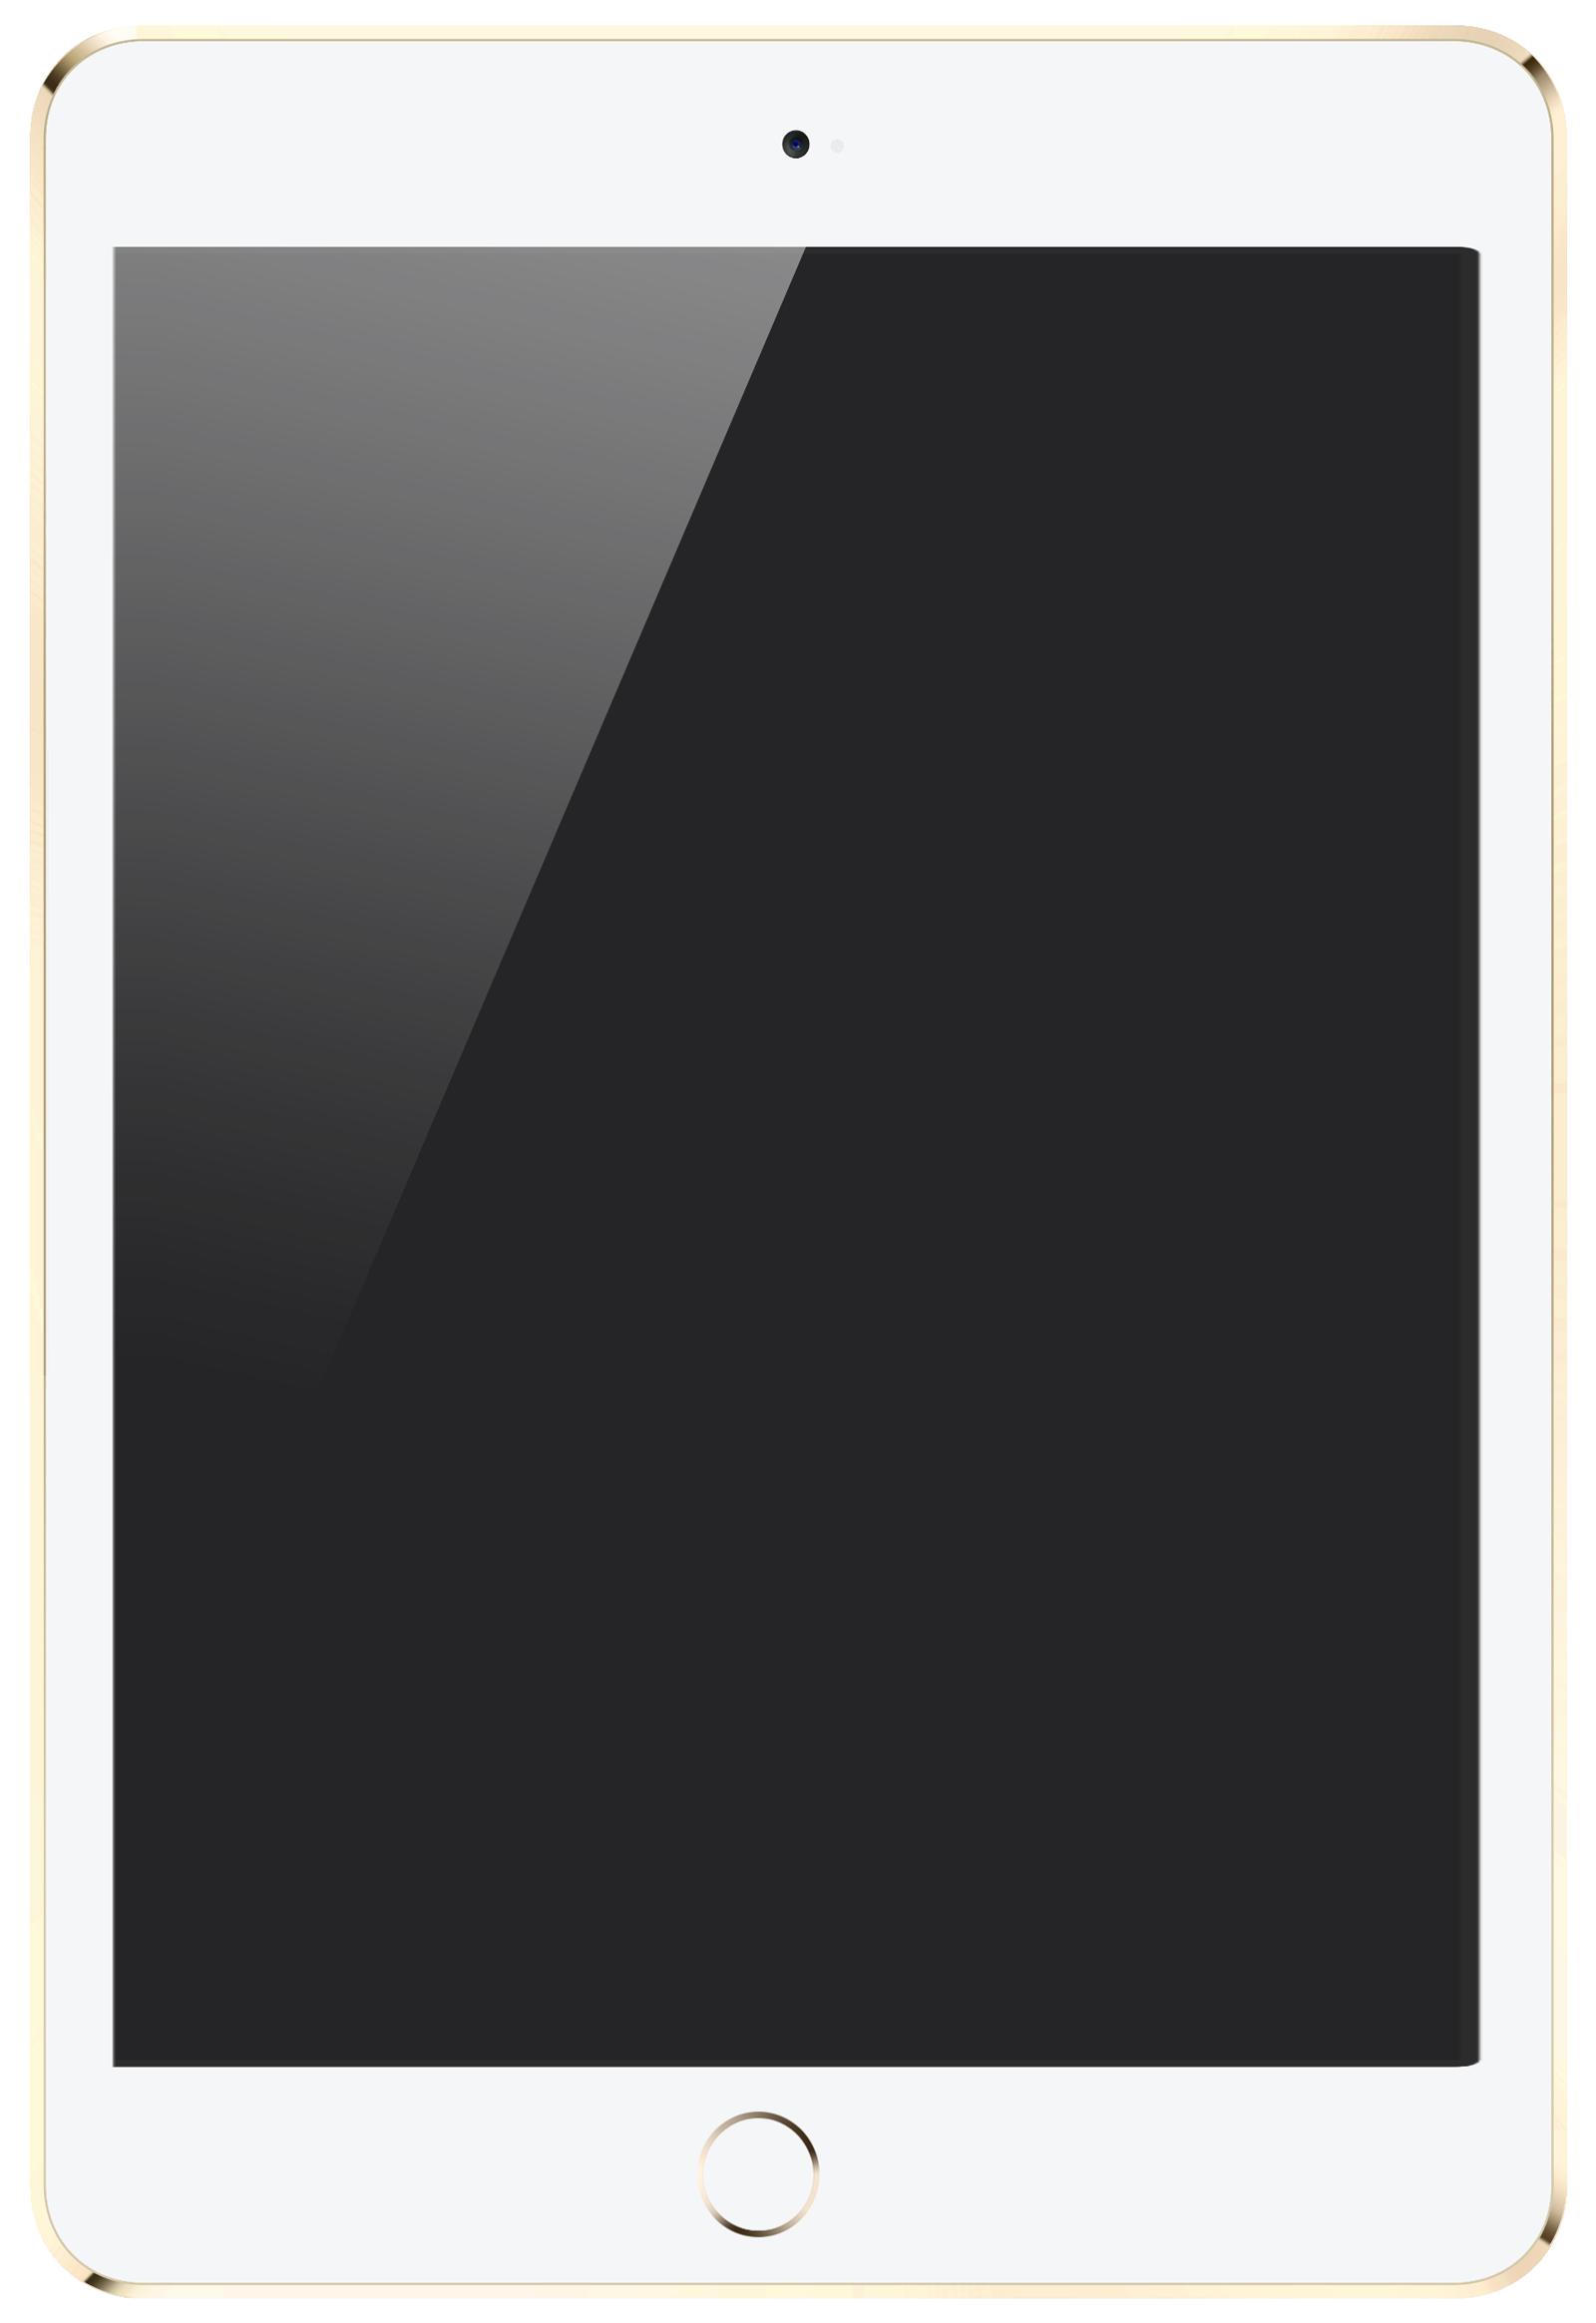 Ipad Air Tablet Png Image Ipad Air Ipad Tablet